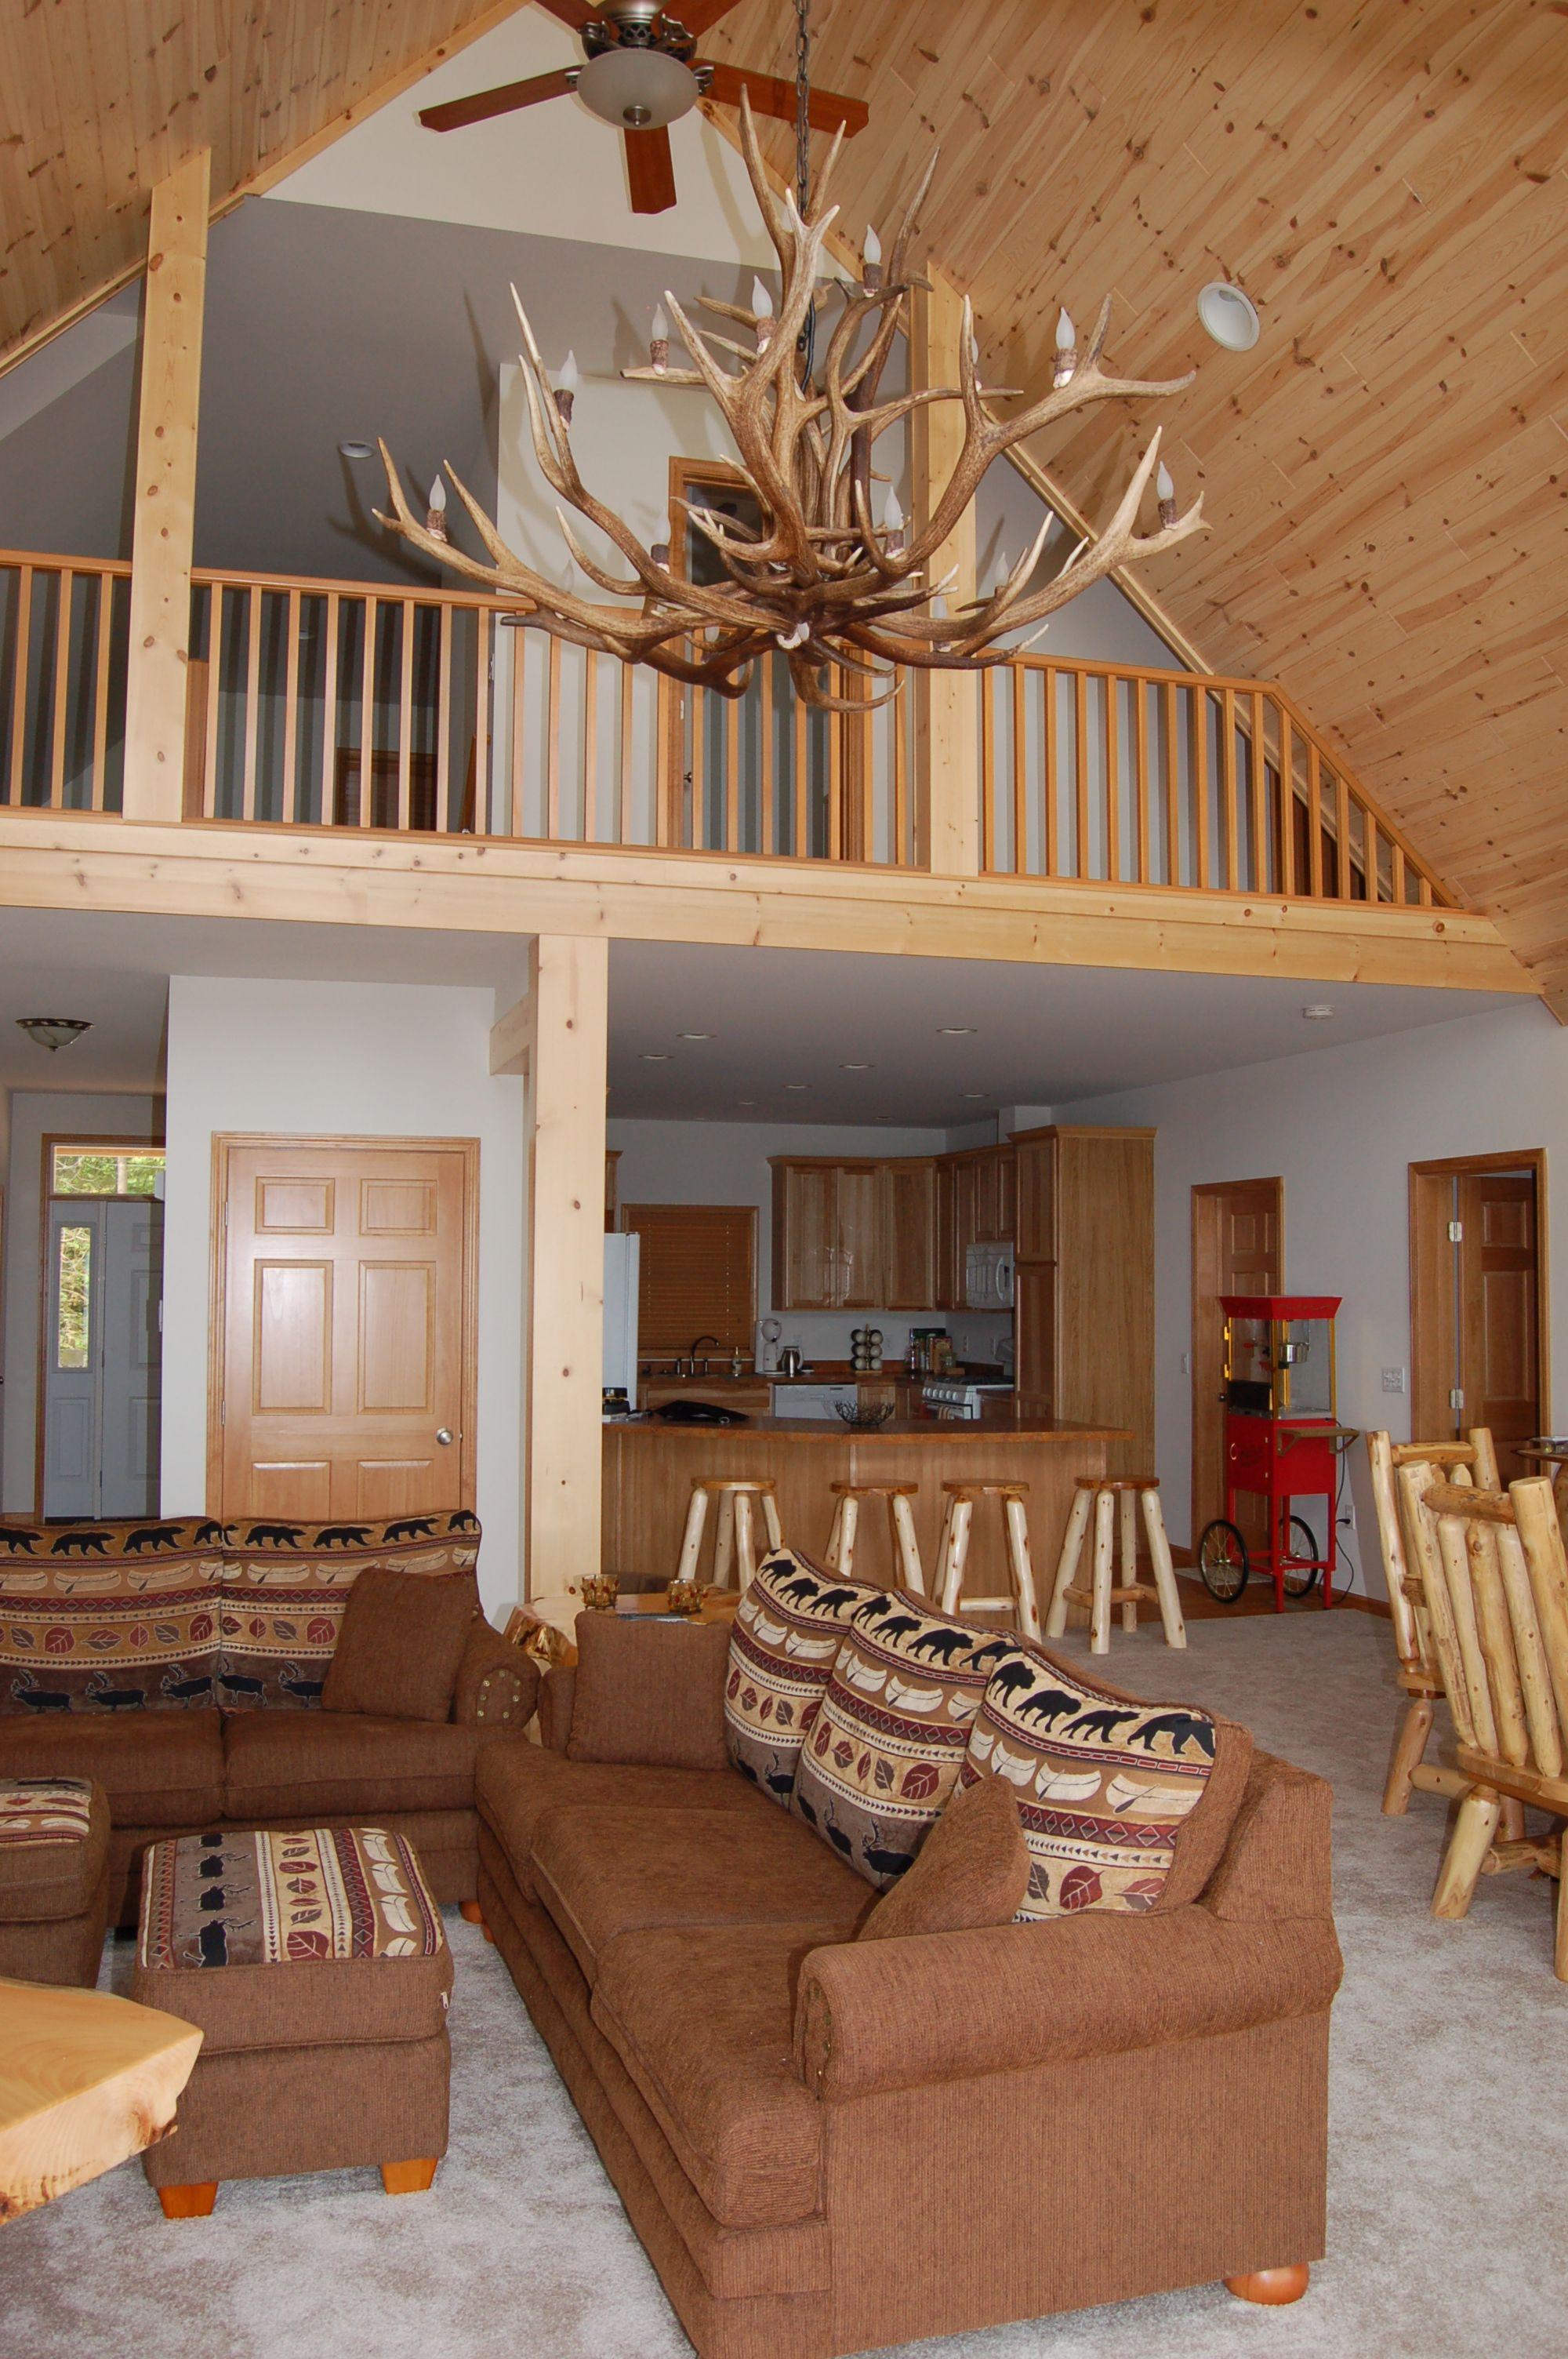 modular home cape cottage interior modular homes on home interior design ideas id=60254